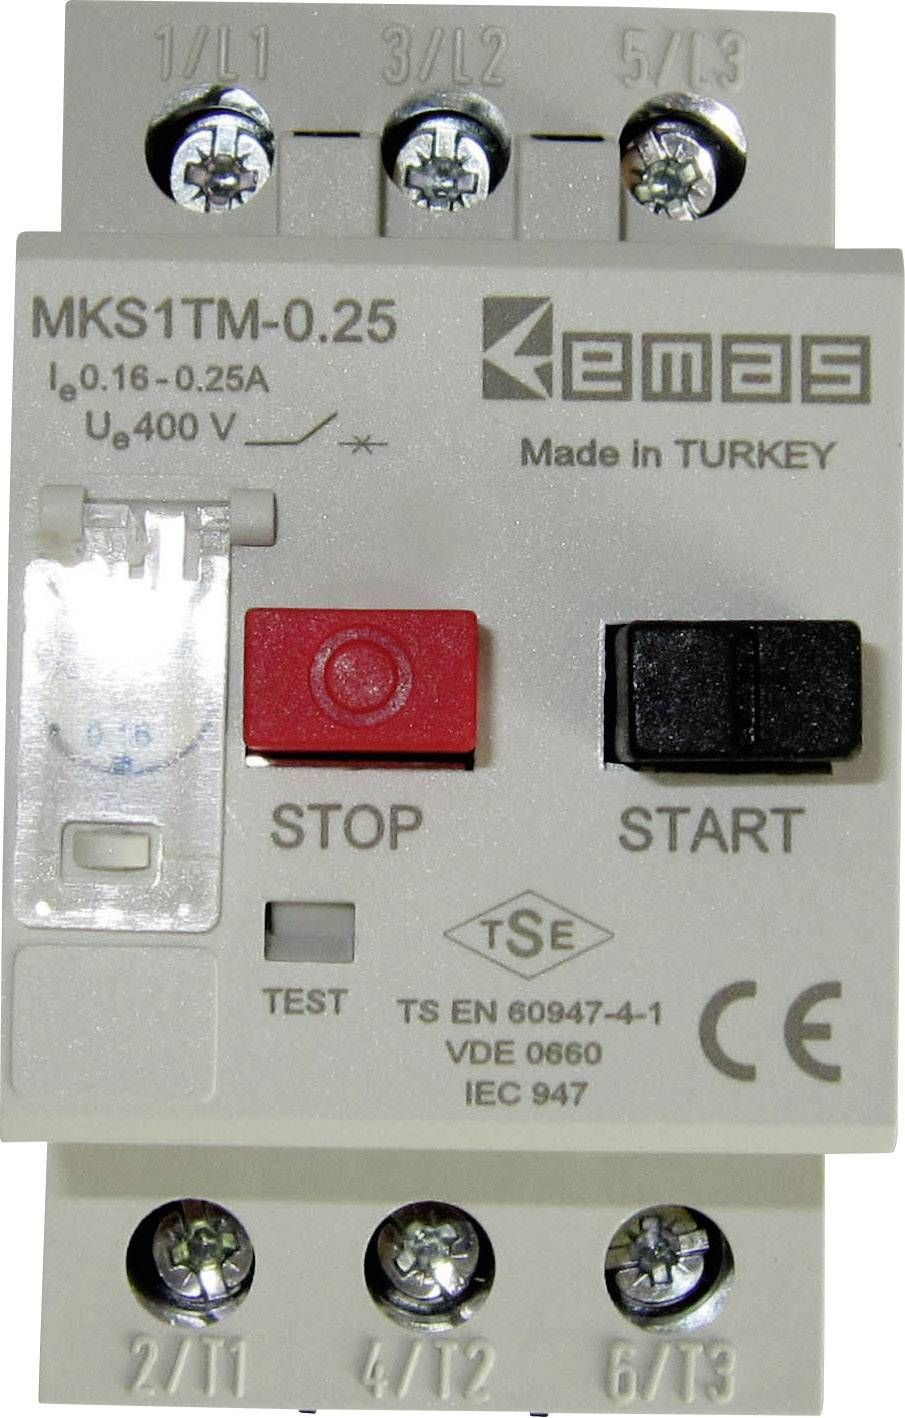 Ochranný spínač motora EMAS MKS1TM-0.25 MKS1TM-0.25, 400 V/AC, 0.25 A, 1 ks